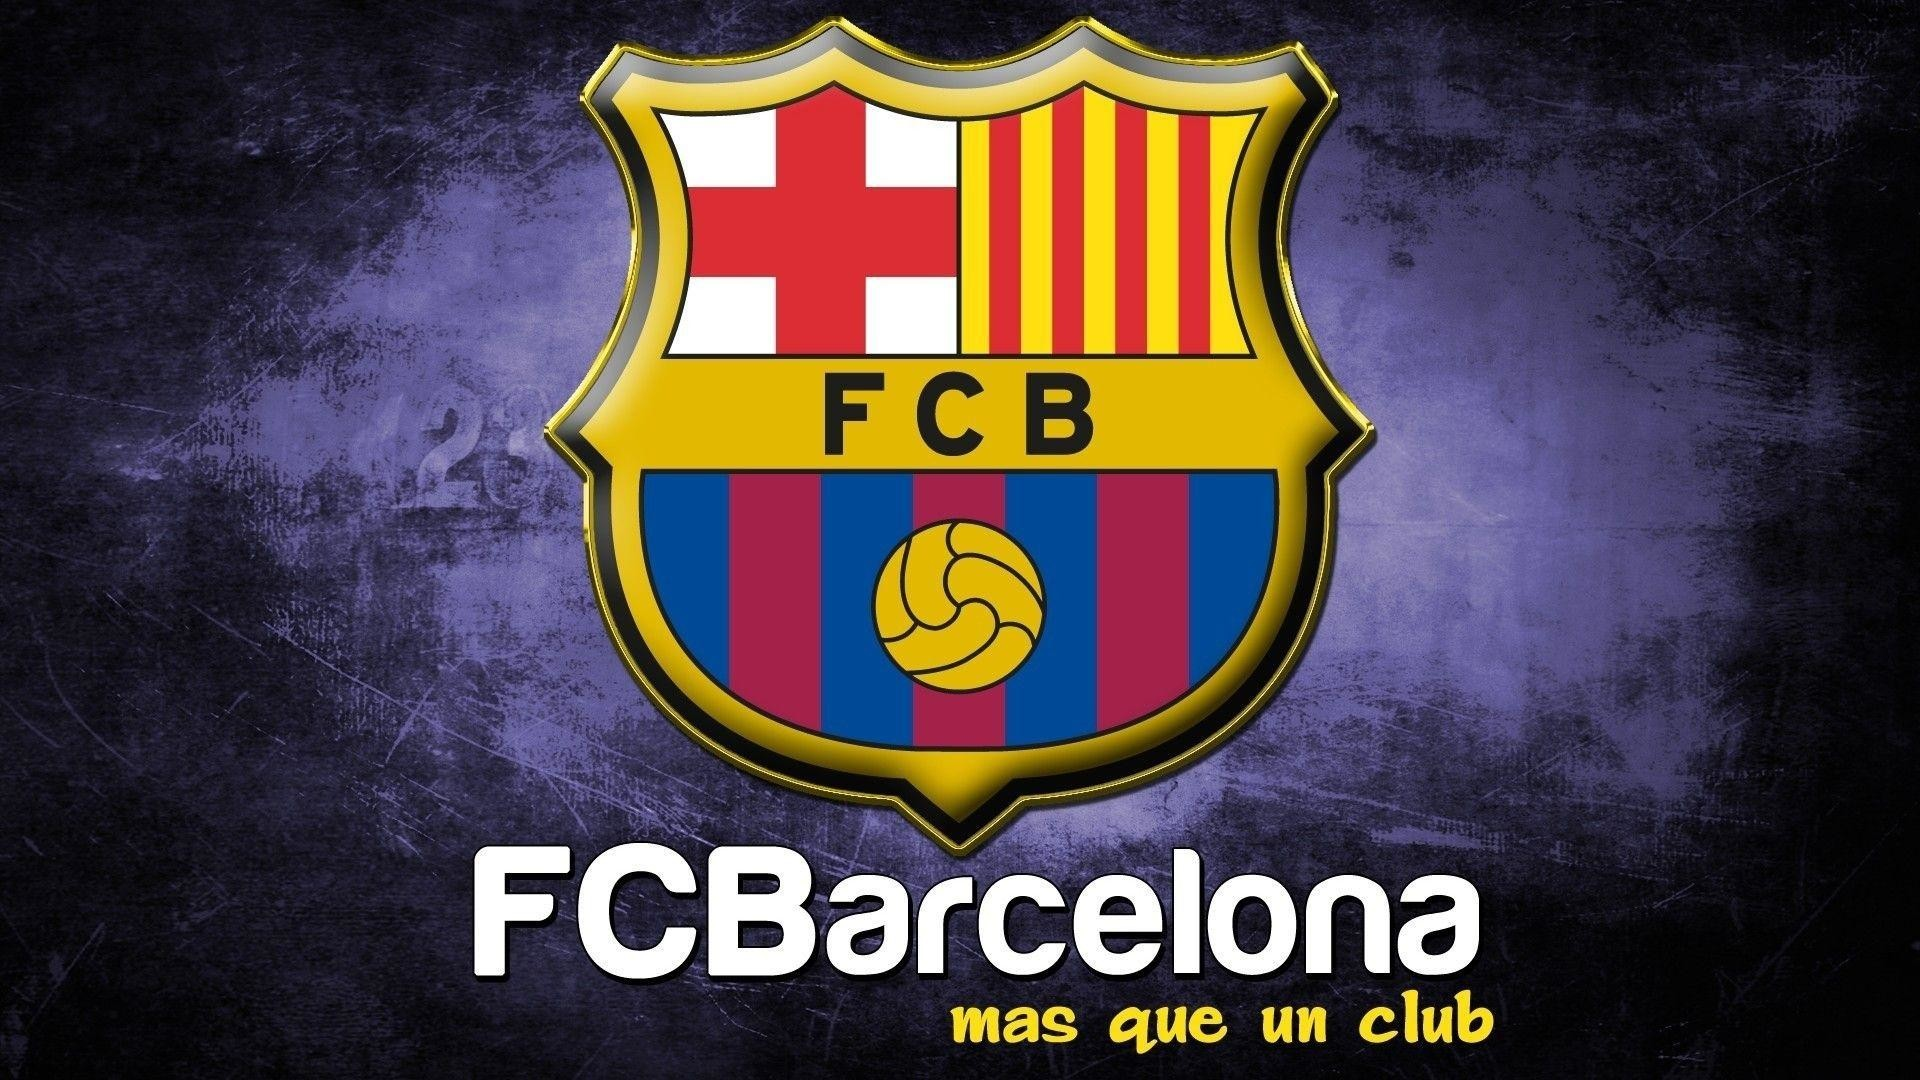 fc barcelona 2018 wallpaper